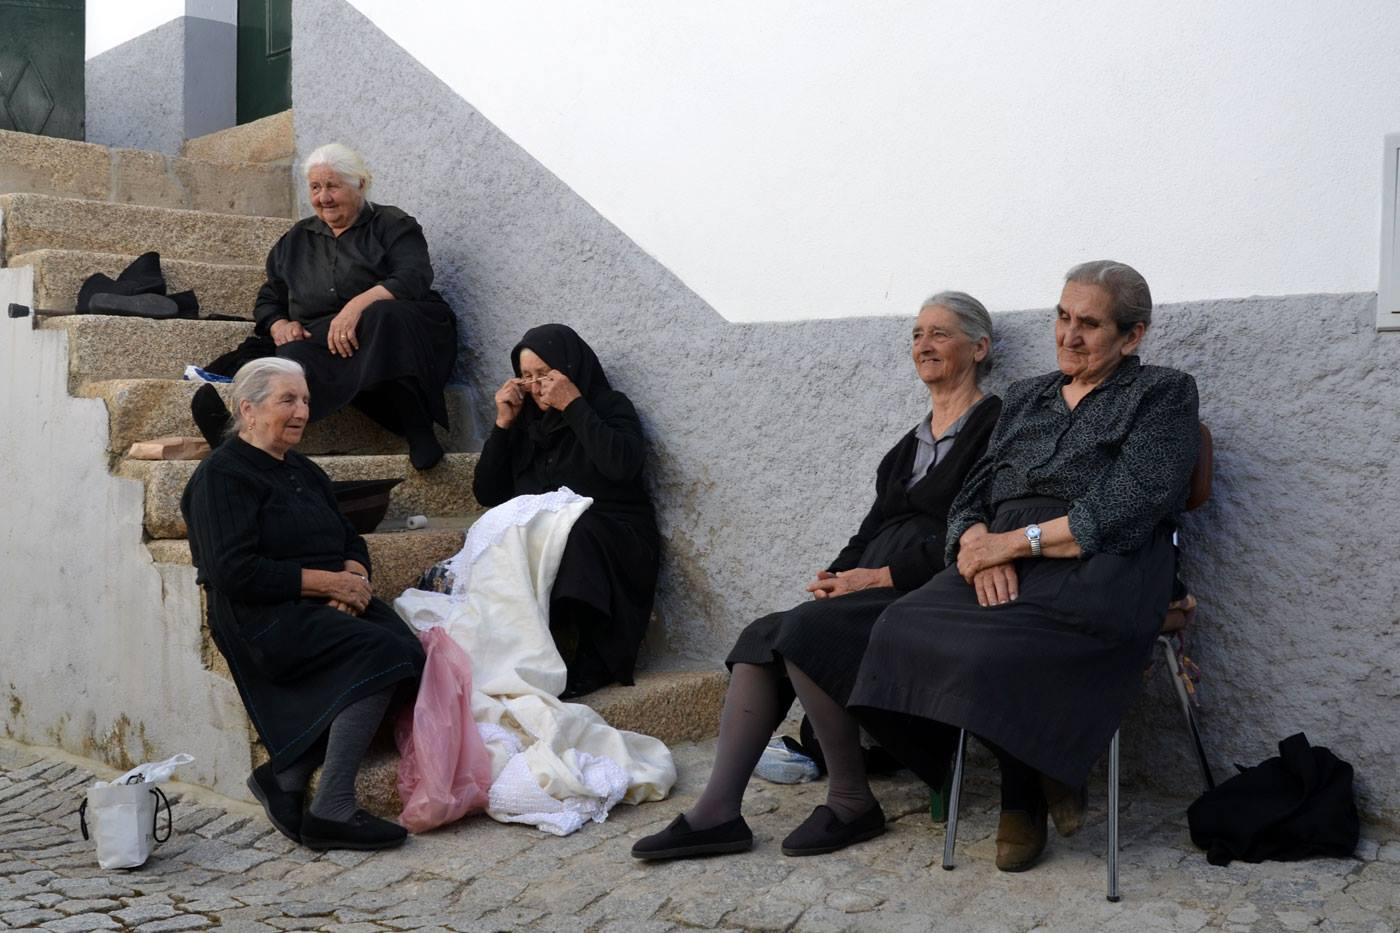 Nespoon - Lacemakers from Póvoa da Atalaia - Portugal3